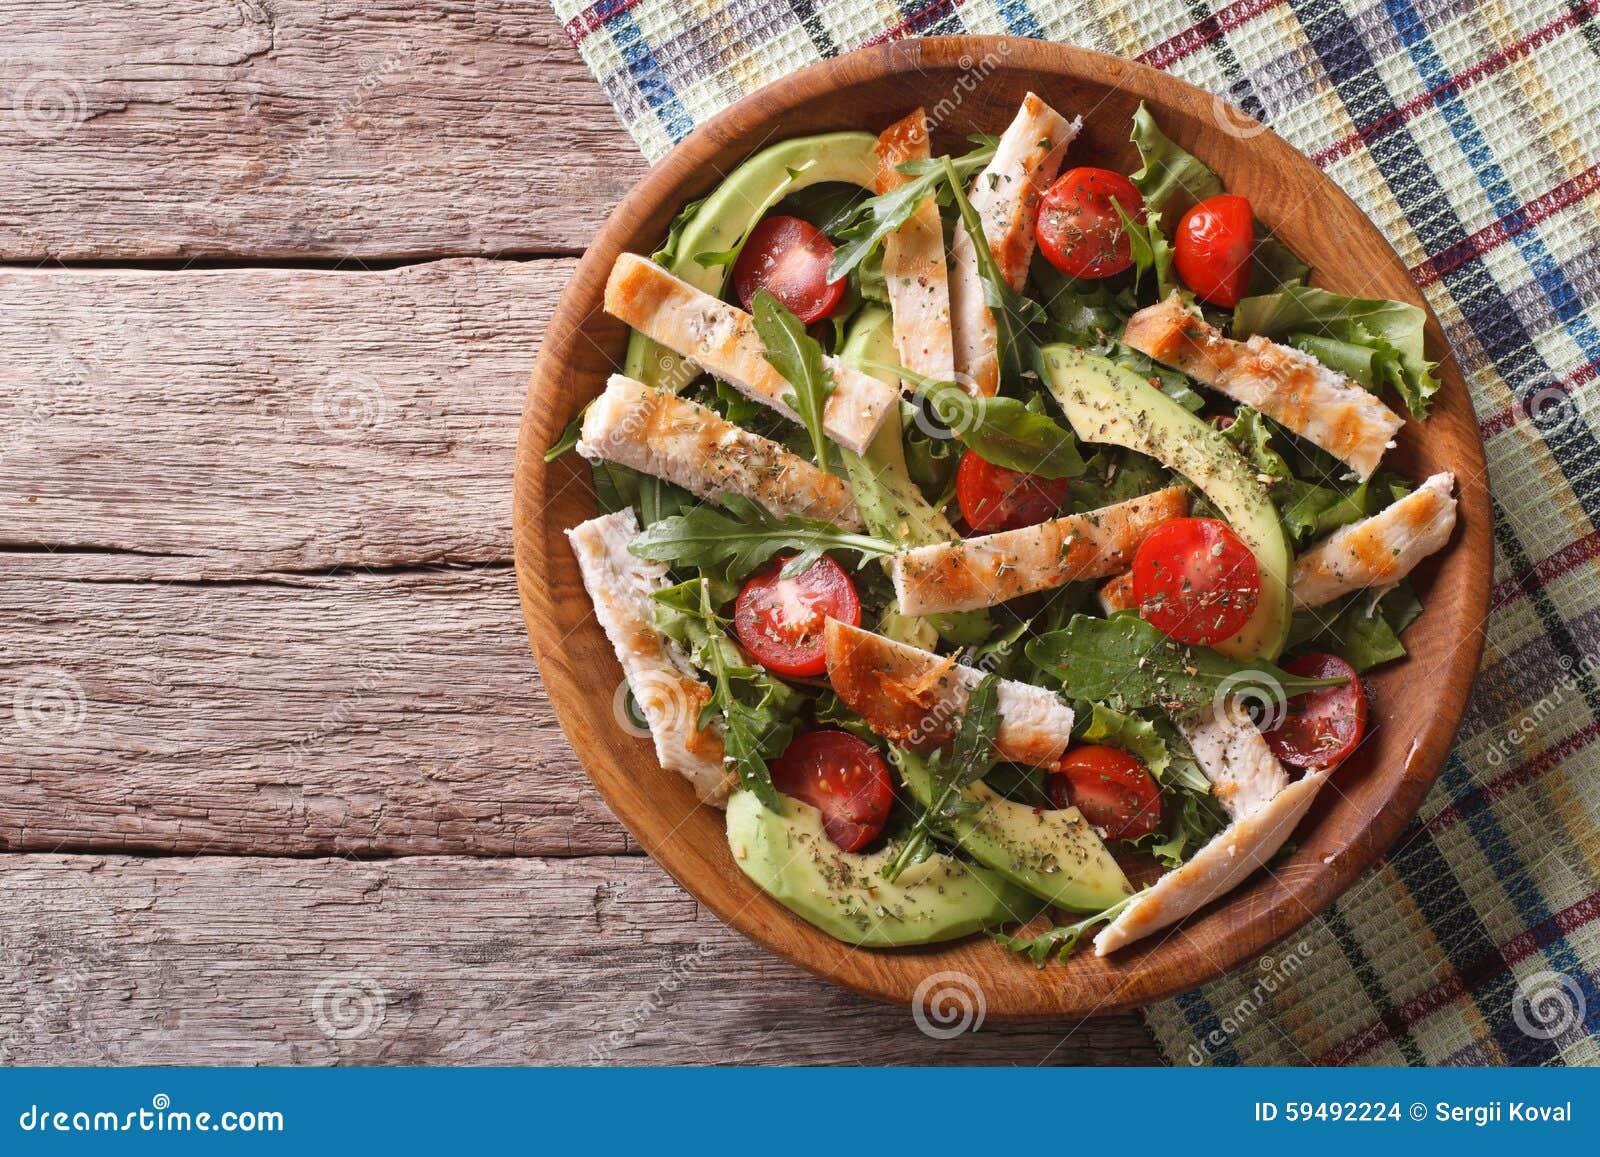 Chicken salad with avocado, arugula and tomatoes. horizontal top